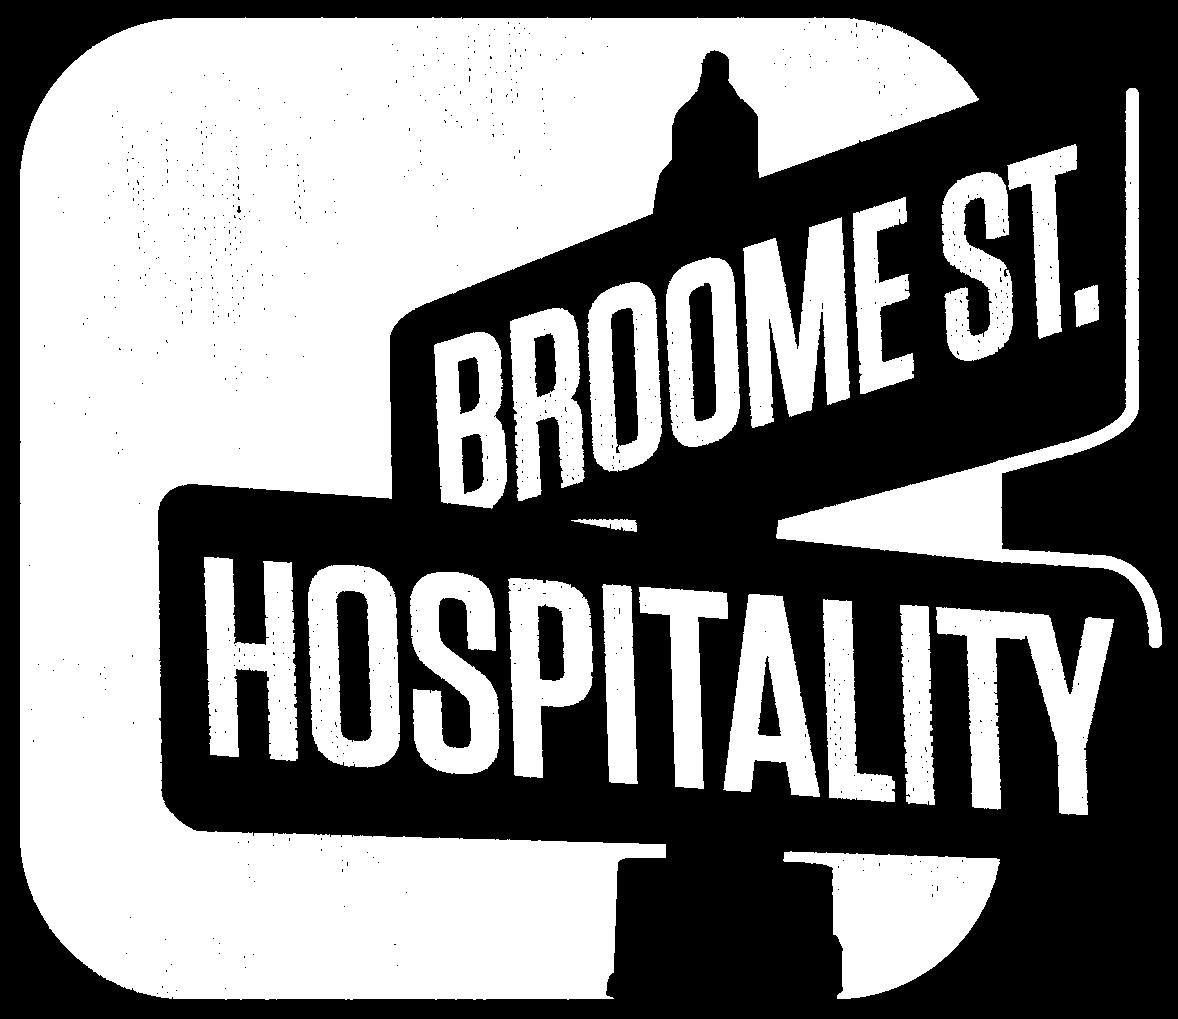 Broome St. Hospitality